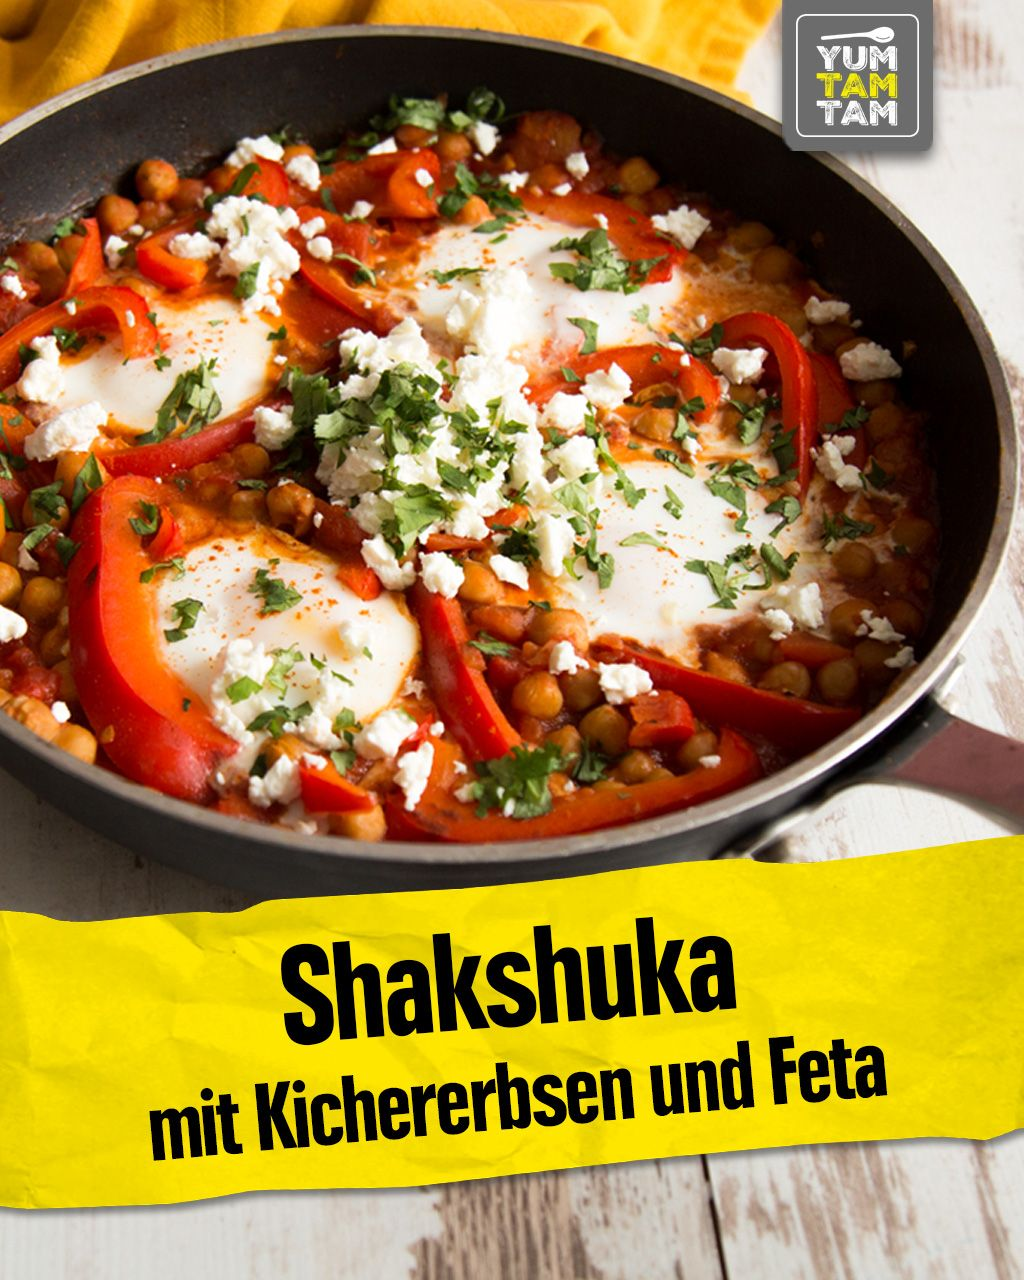 Shakshuka mit Kichererbsen und Feta